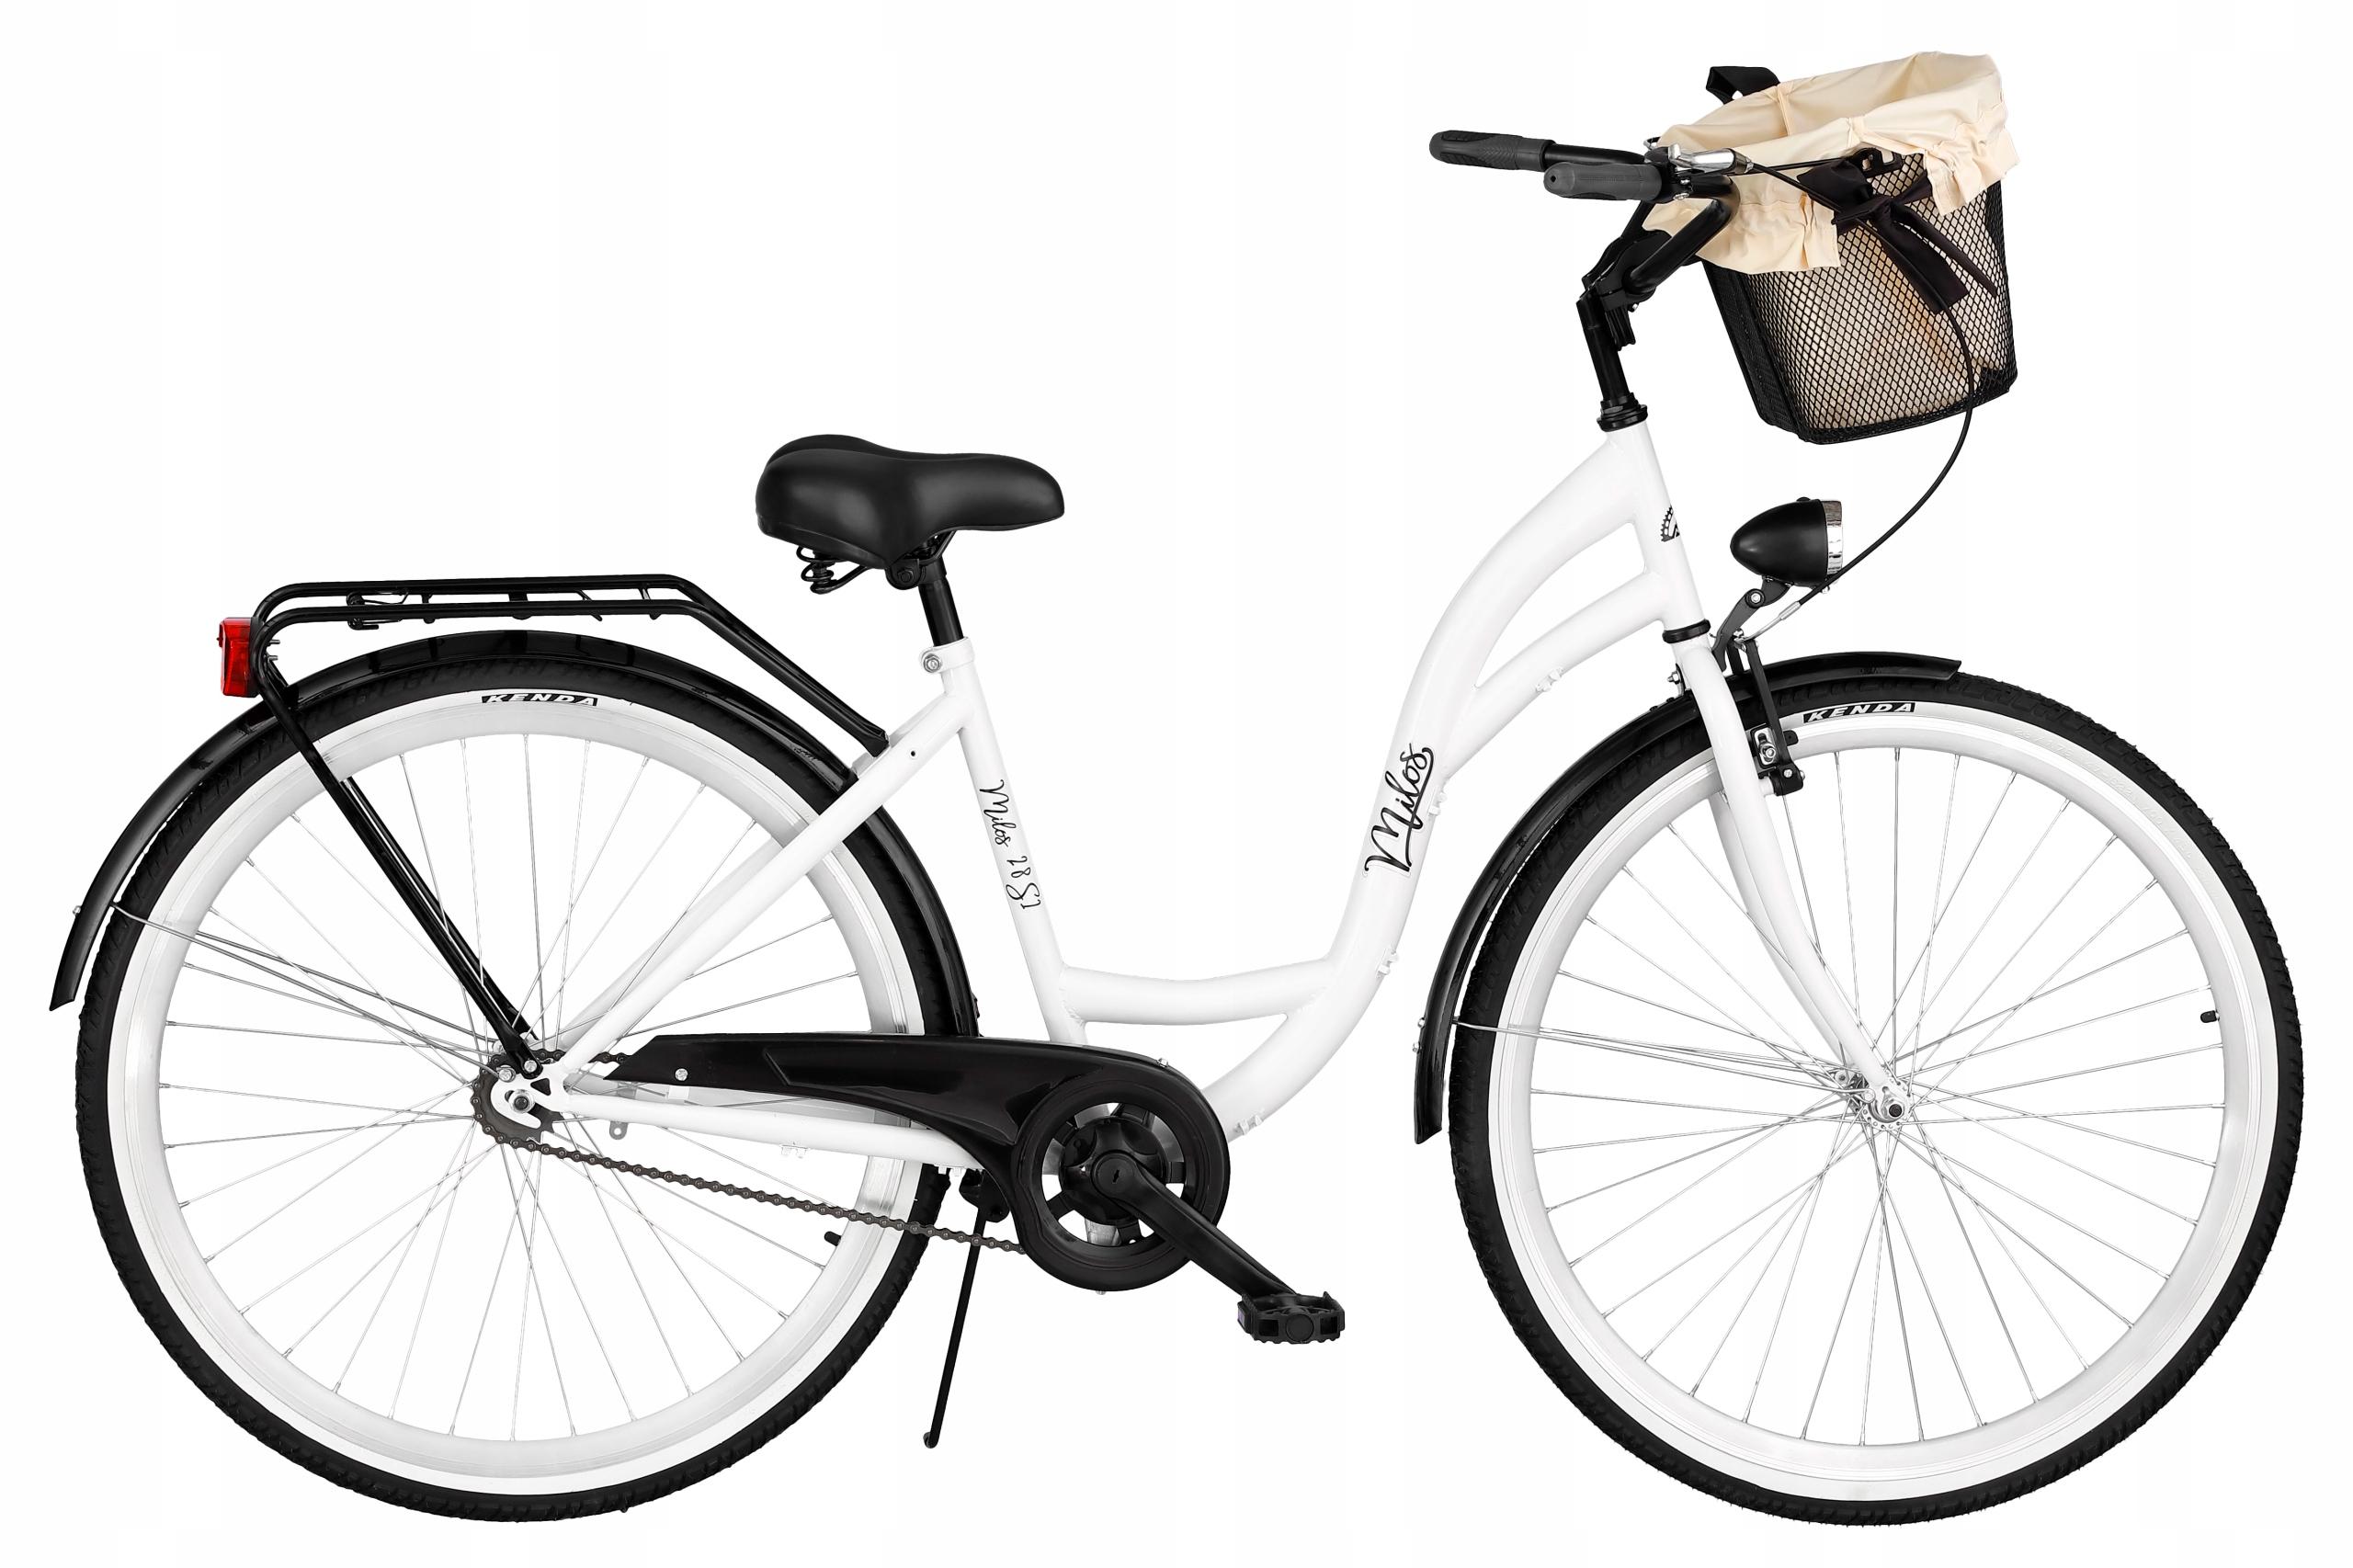 Mestský bicykel MILOS 26 '' kôš S1 + vložka